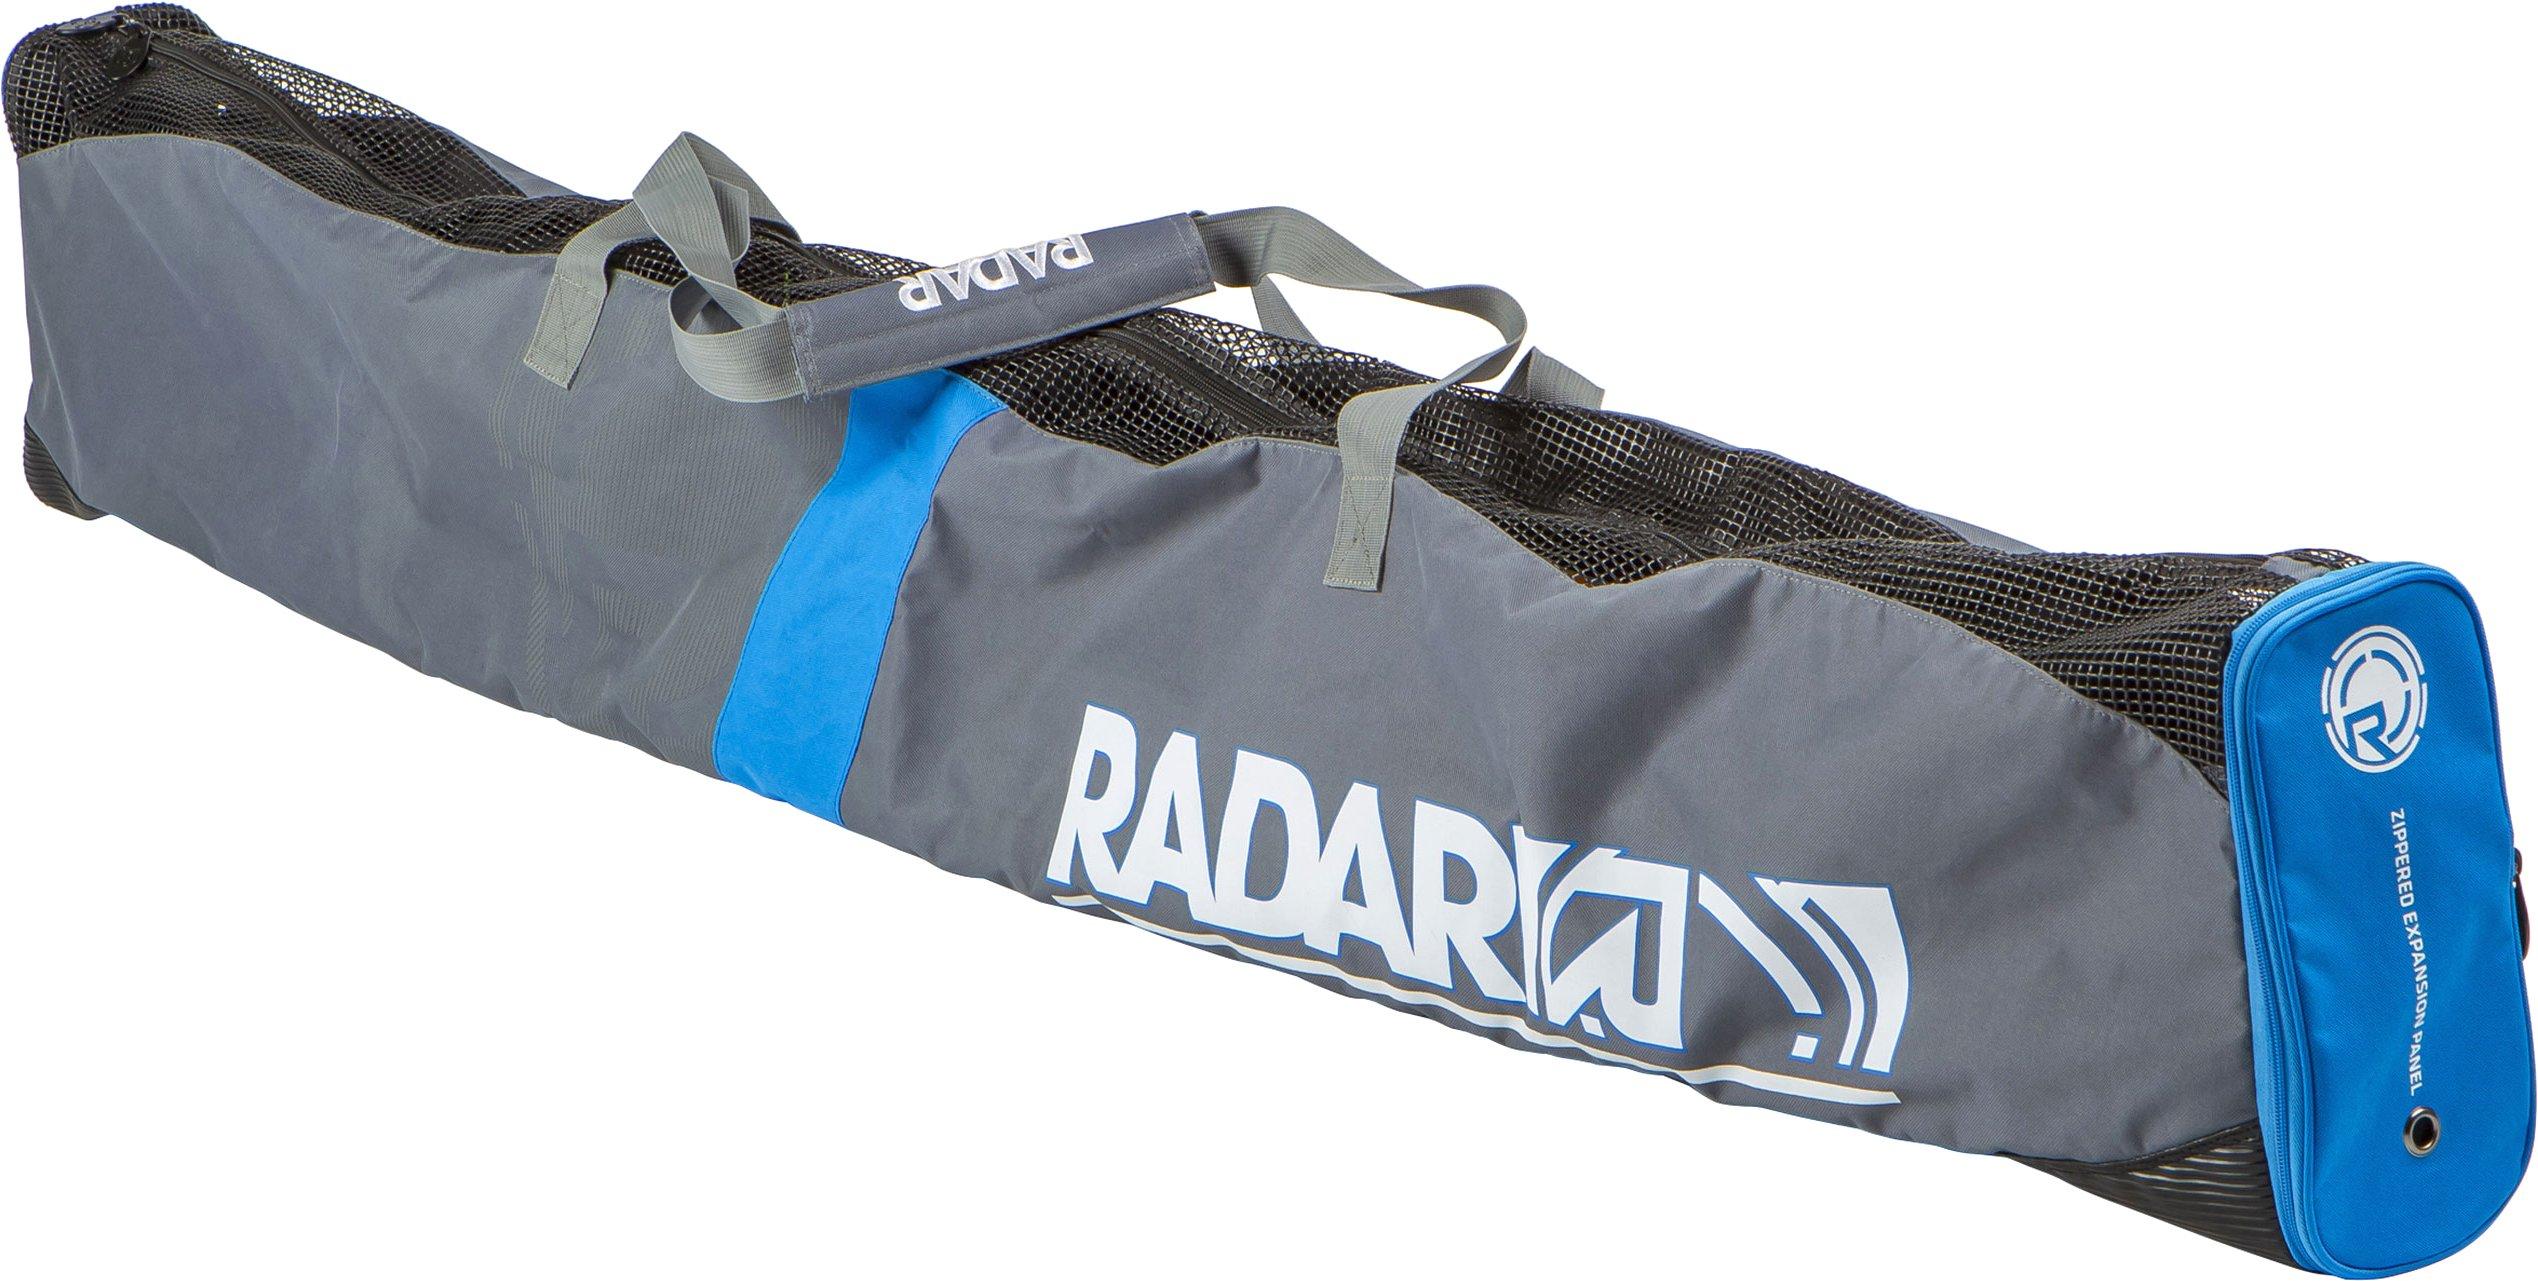 Radar Unpadded Waterski Bag